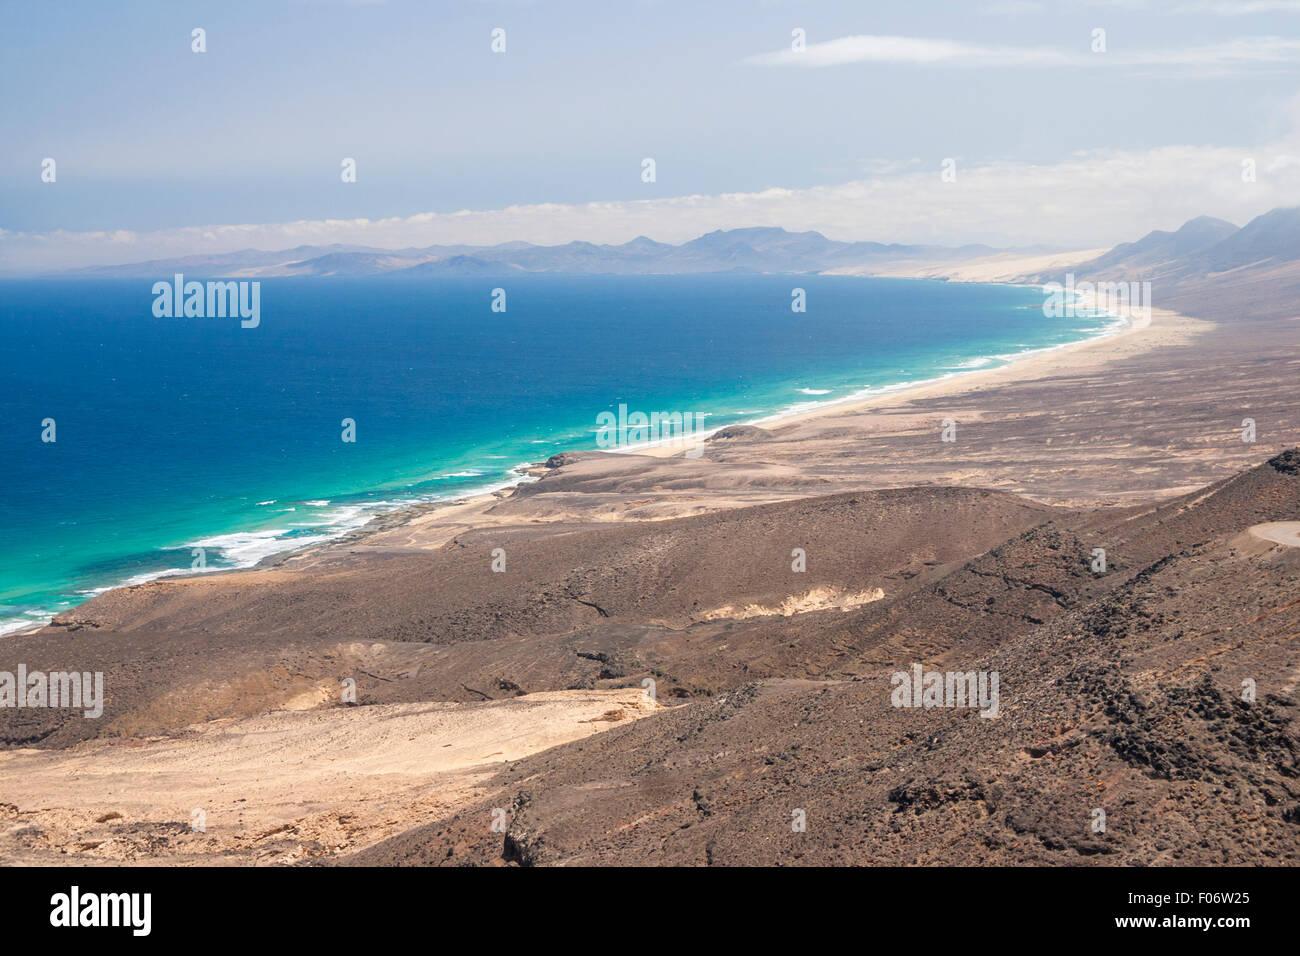 Cofete beach on the south west coast of Fuerteventura - Stock Image